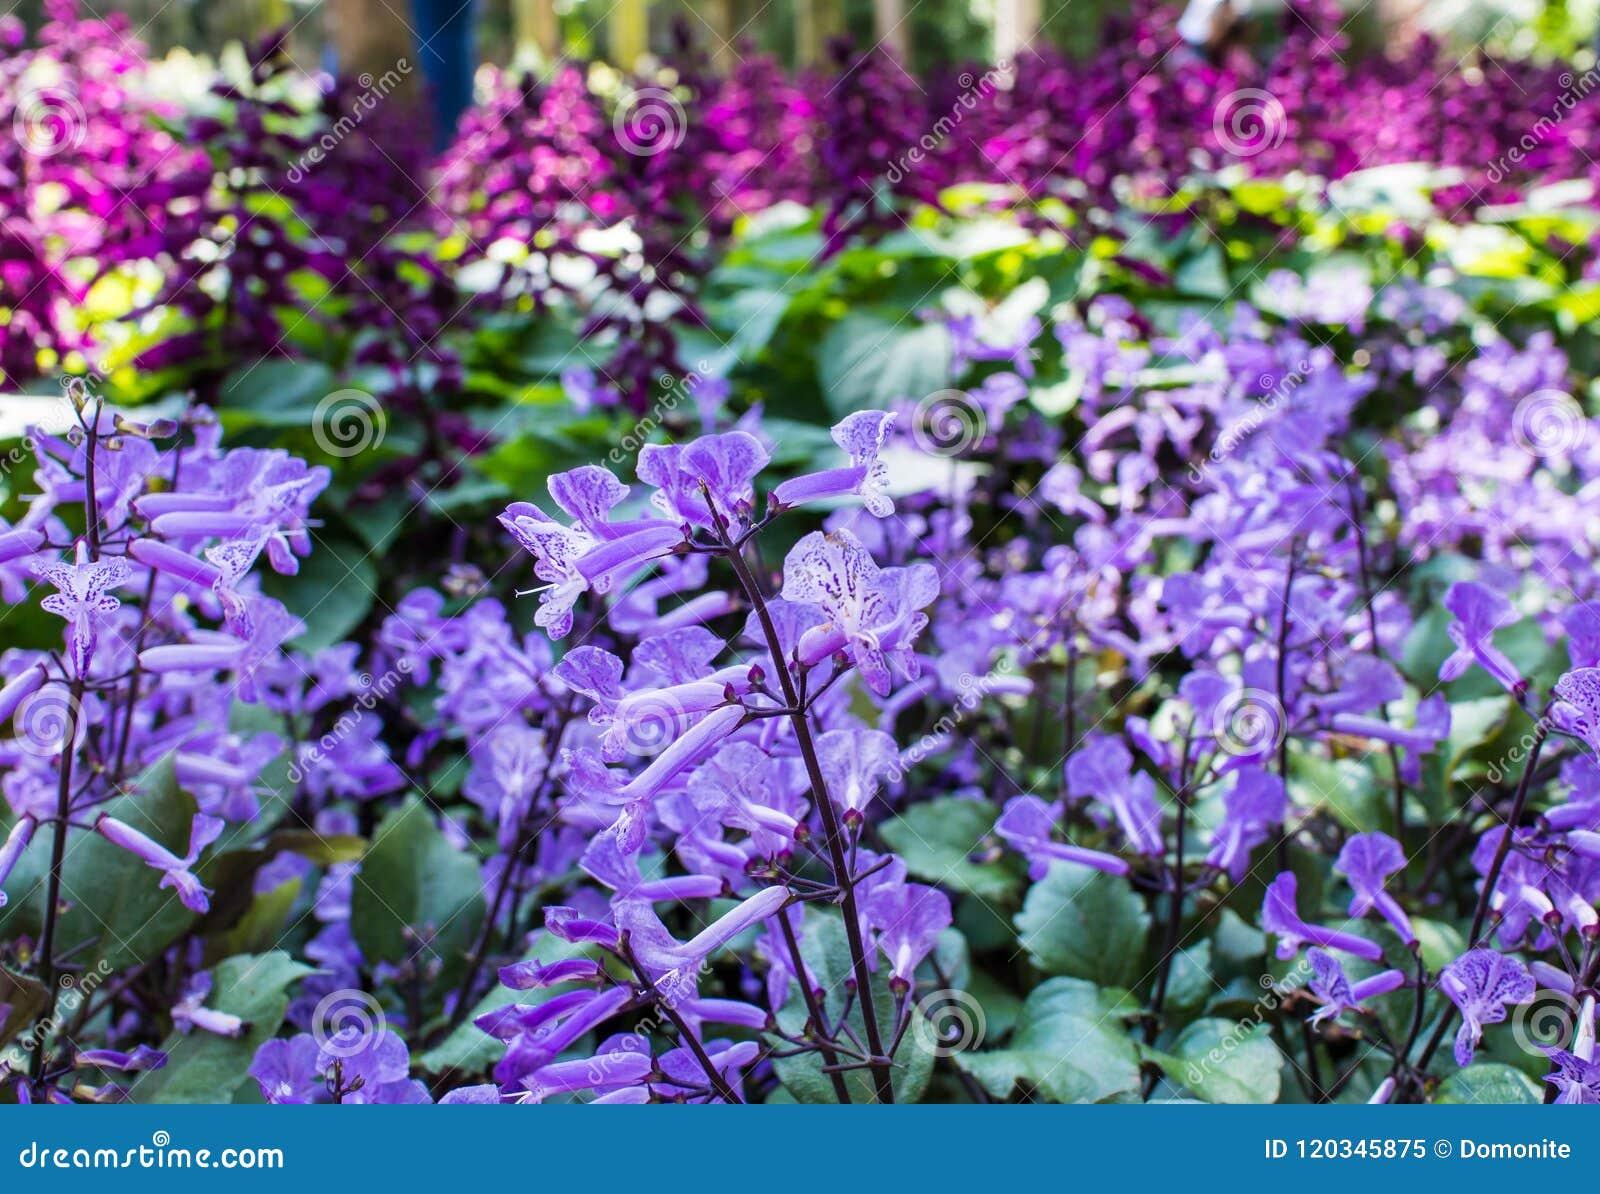 Violet Flowers In The Garden Stock Image Image Of Blue Crocus